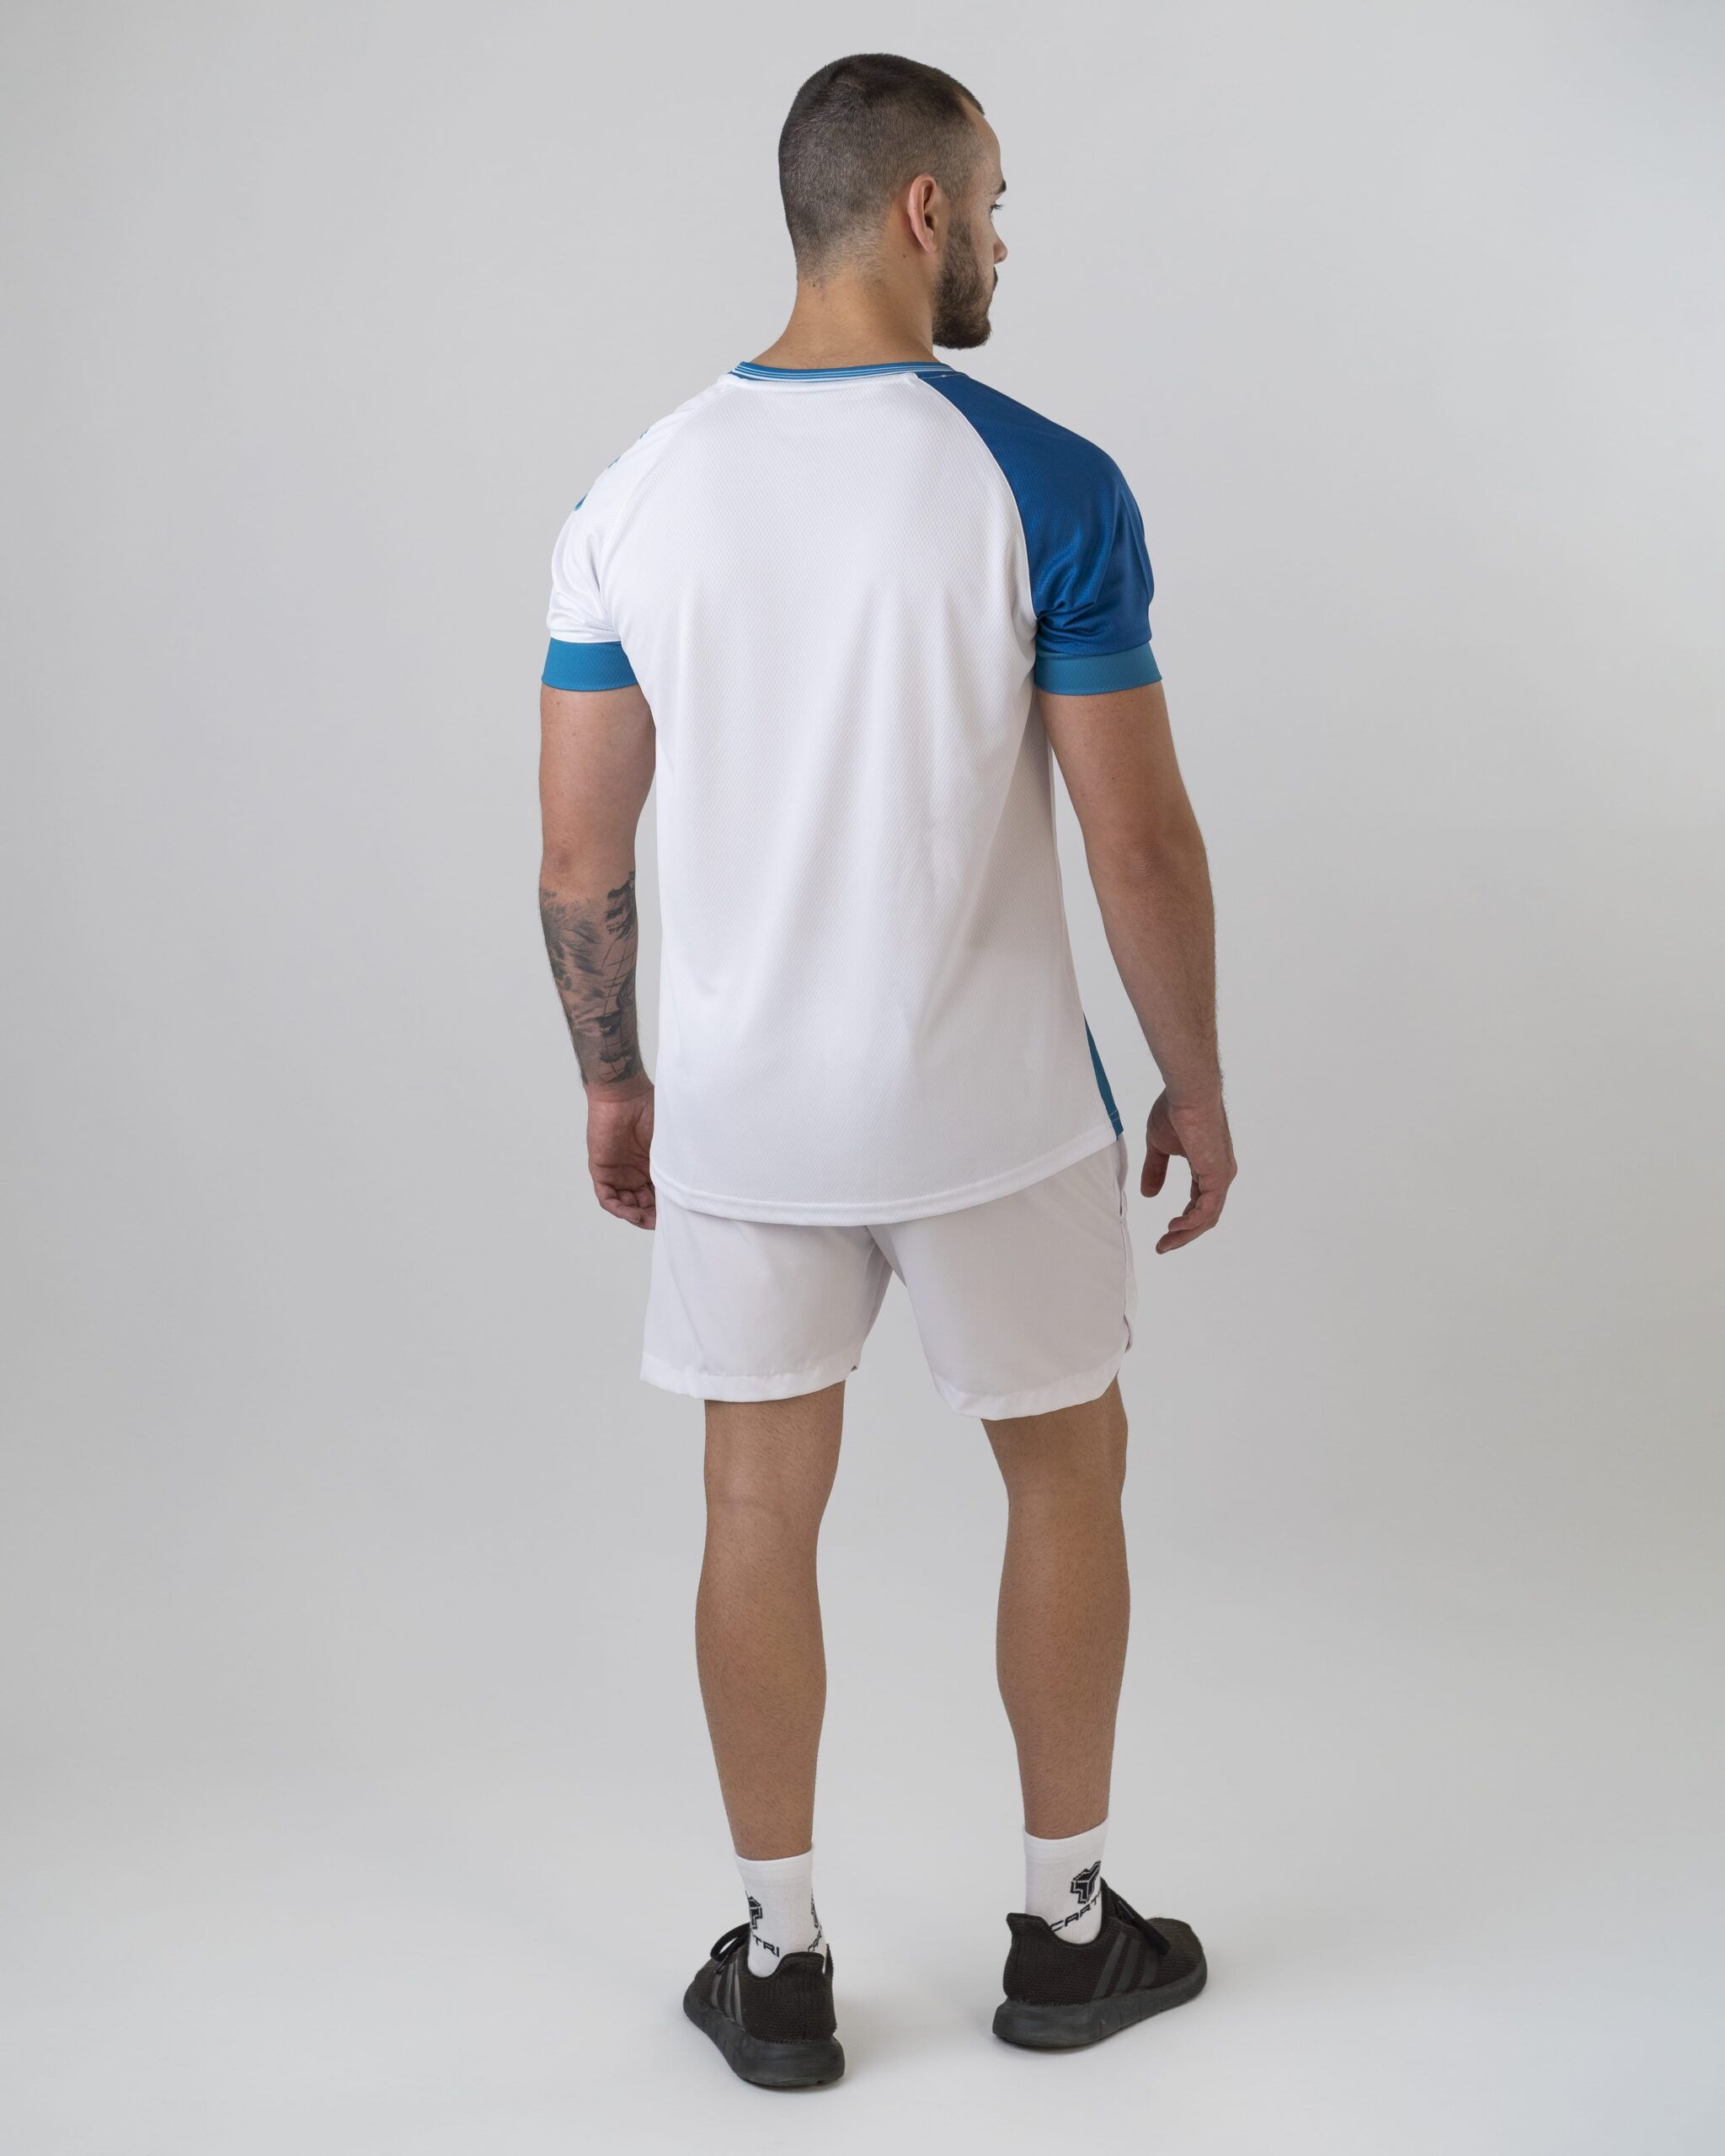 Cartri T Shirt Manchester 2021 Back